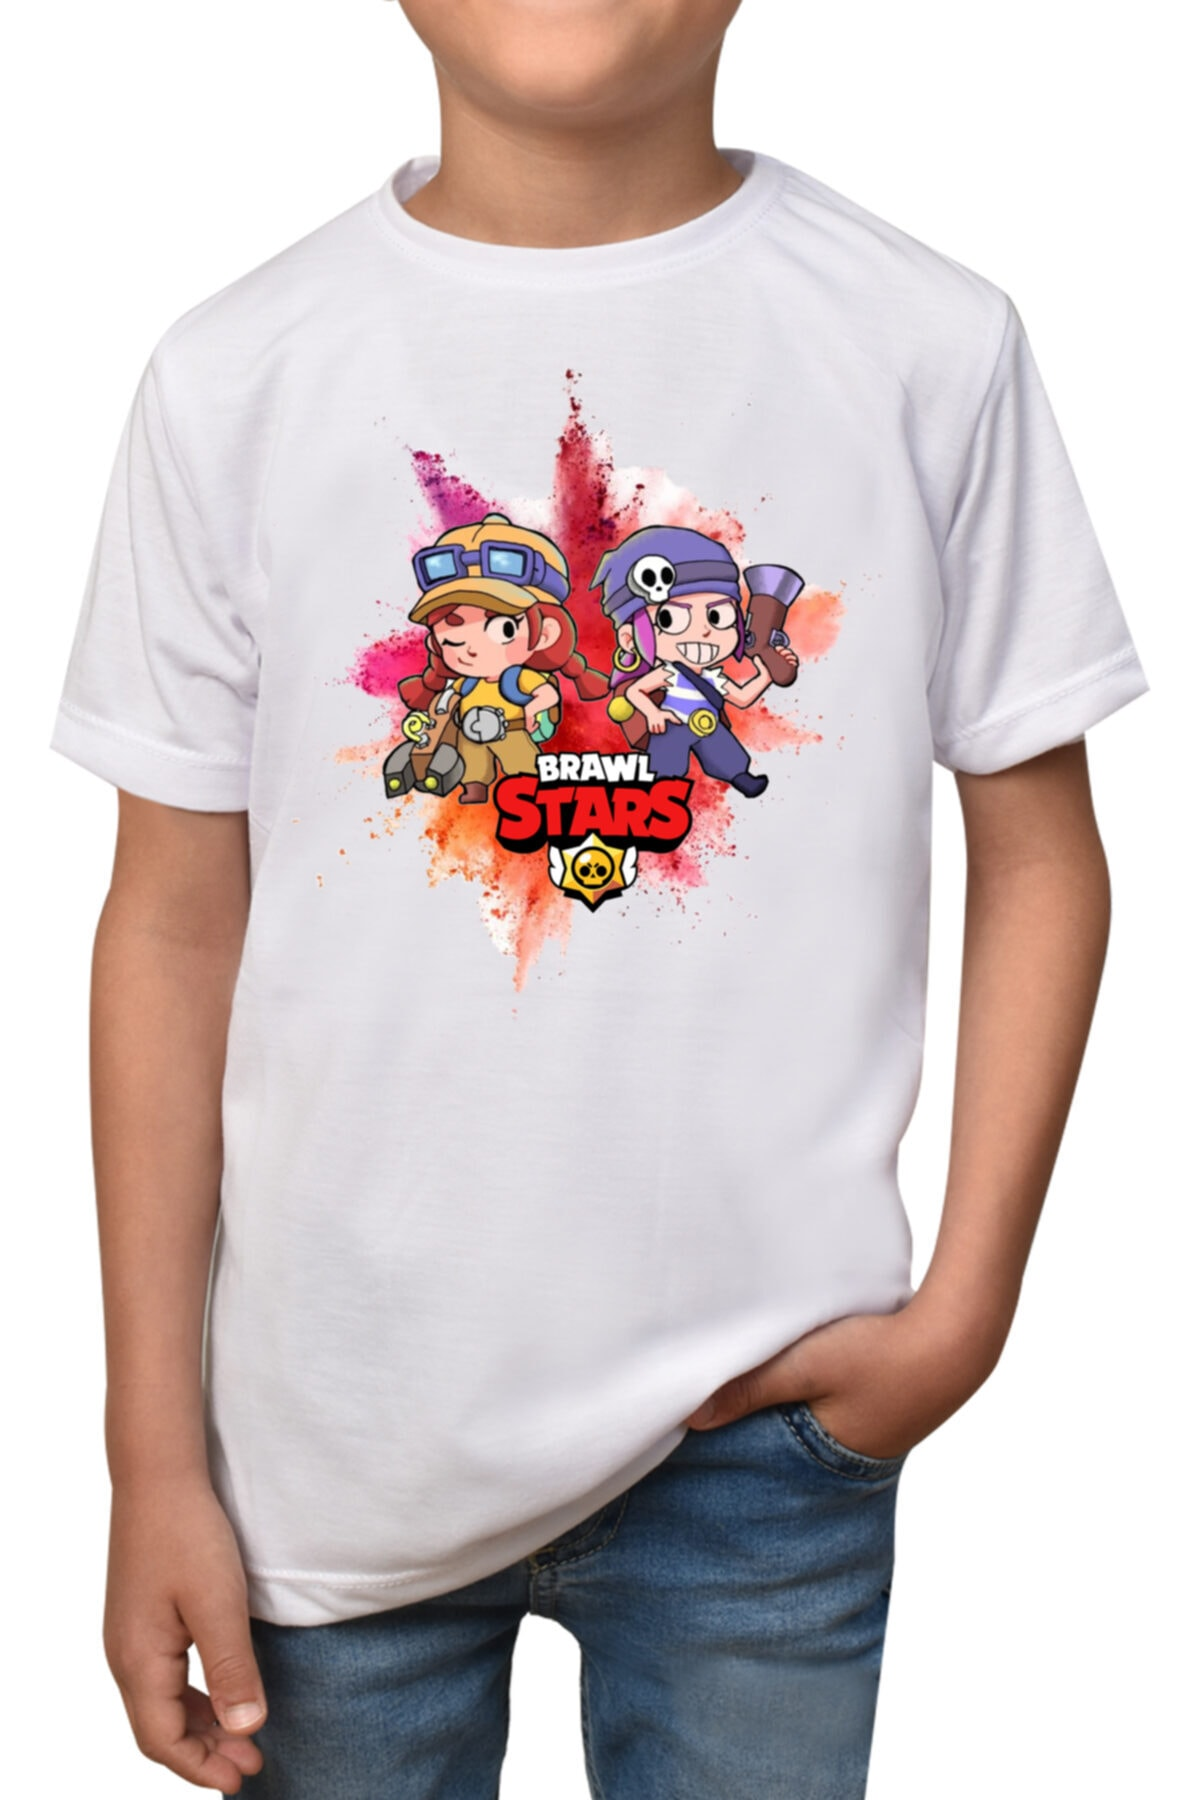 Brawl Stars - Penny-t-1- Beyaz Çocuk - Yetişkin Unisex T-shirt T-5